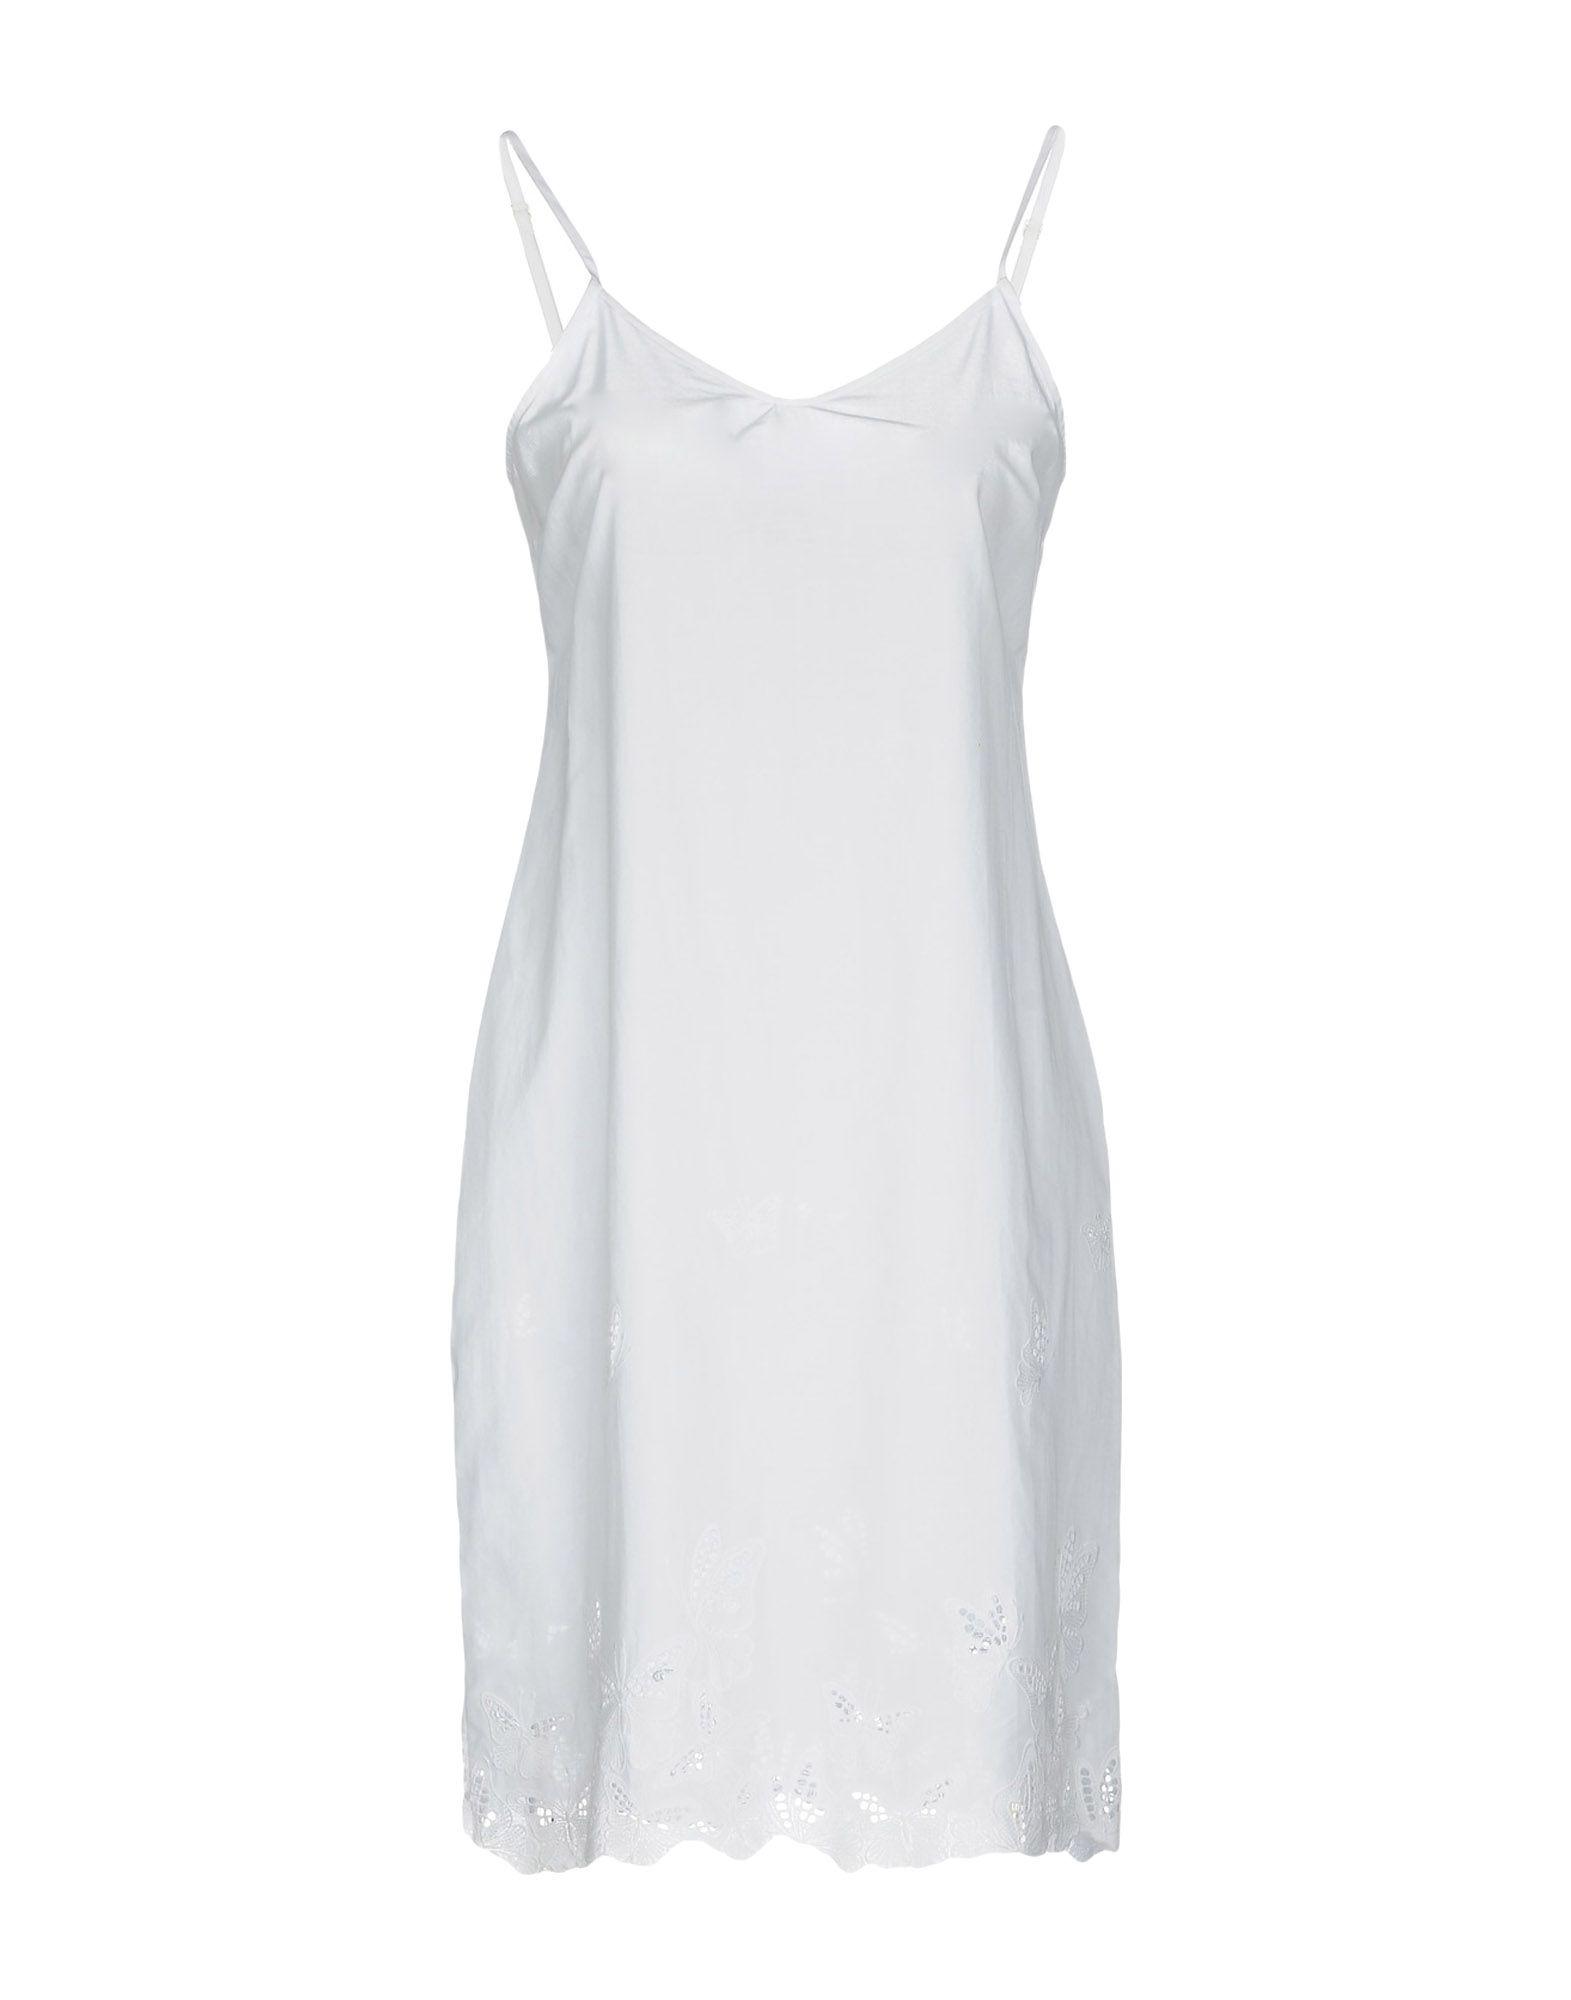 MISS NAORY Короткое платье платье miss selfridge miss selfridge mi035ewxyg42